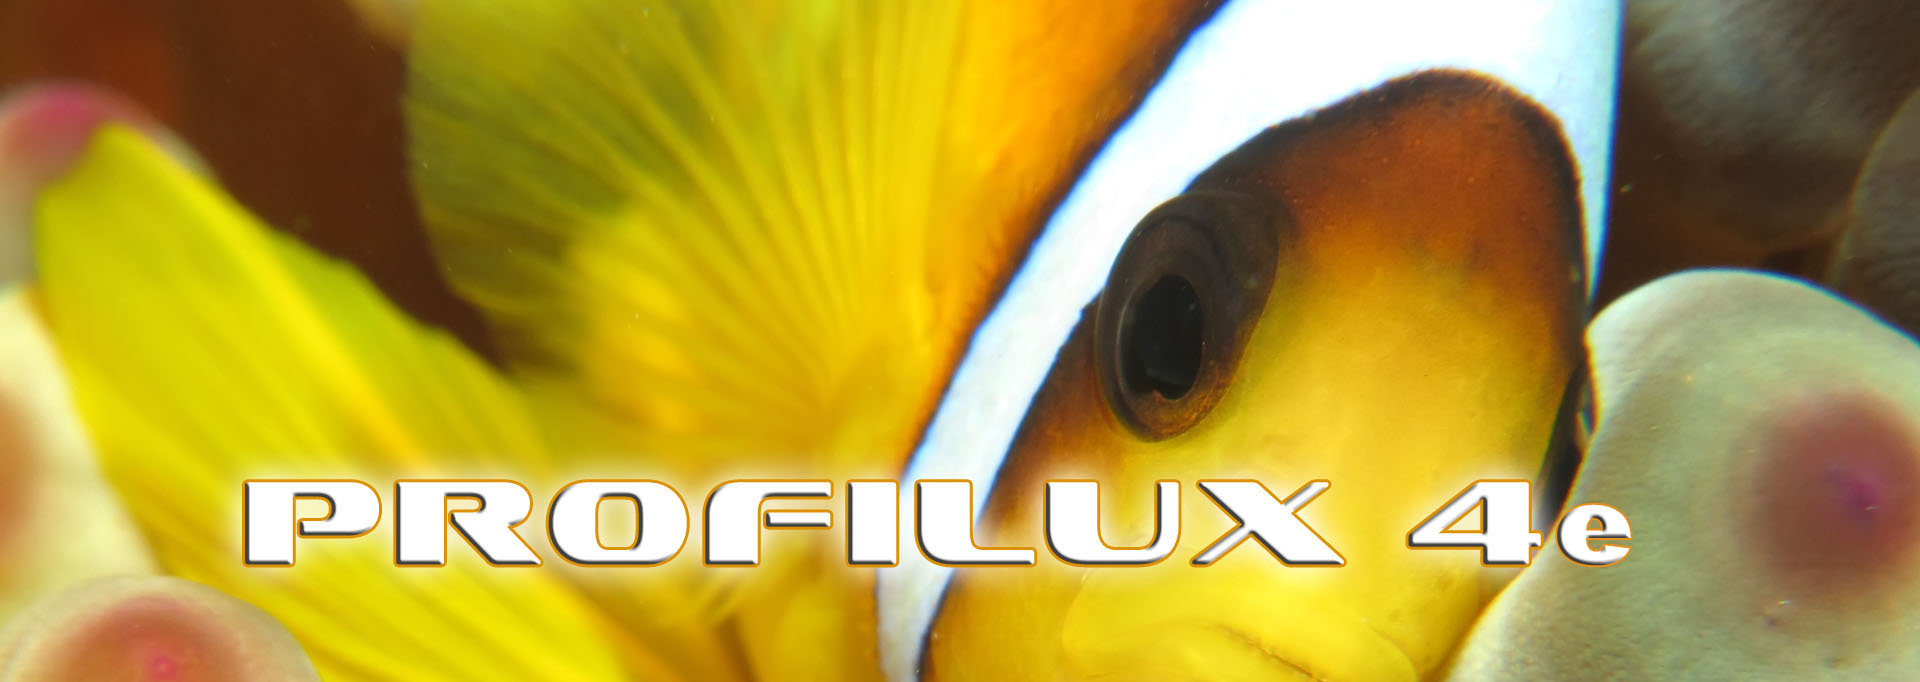 Korallen_Banner_4e_1920x681